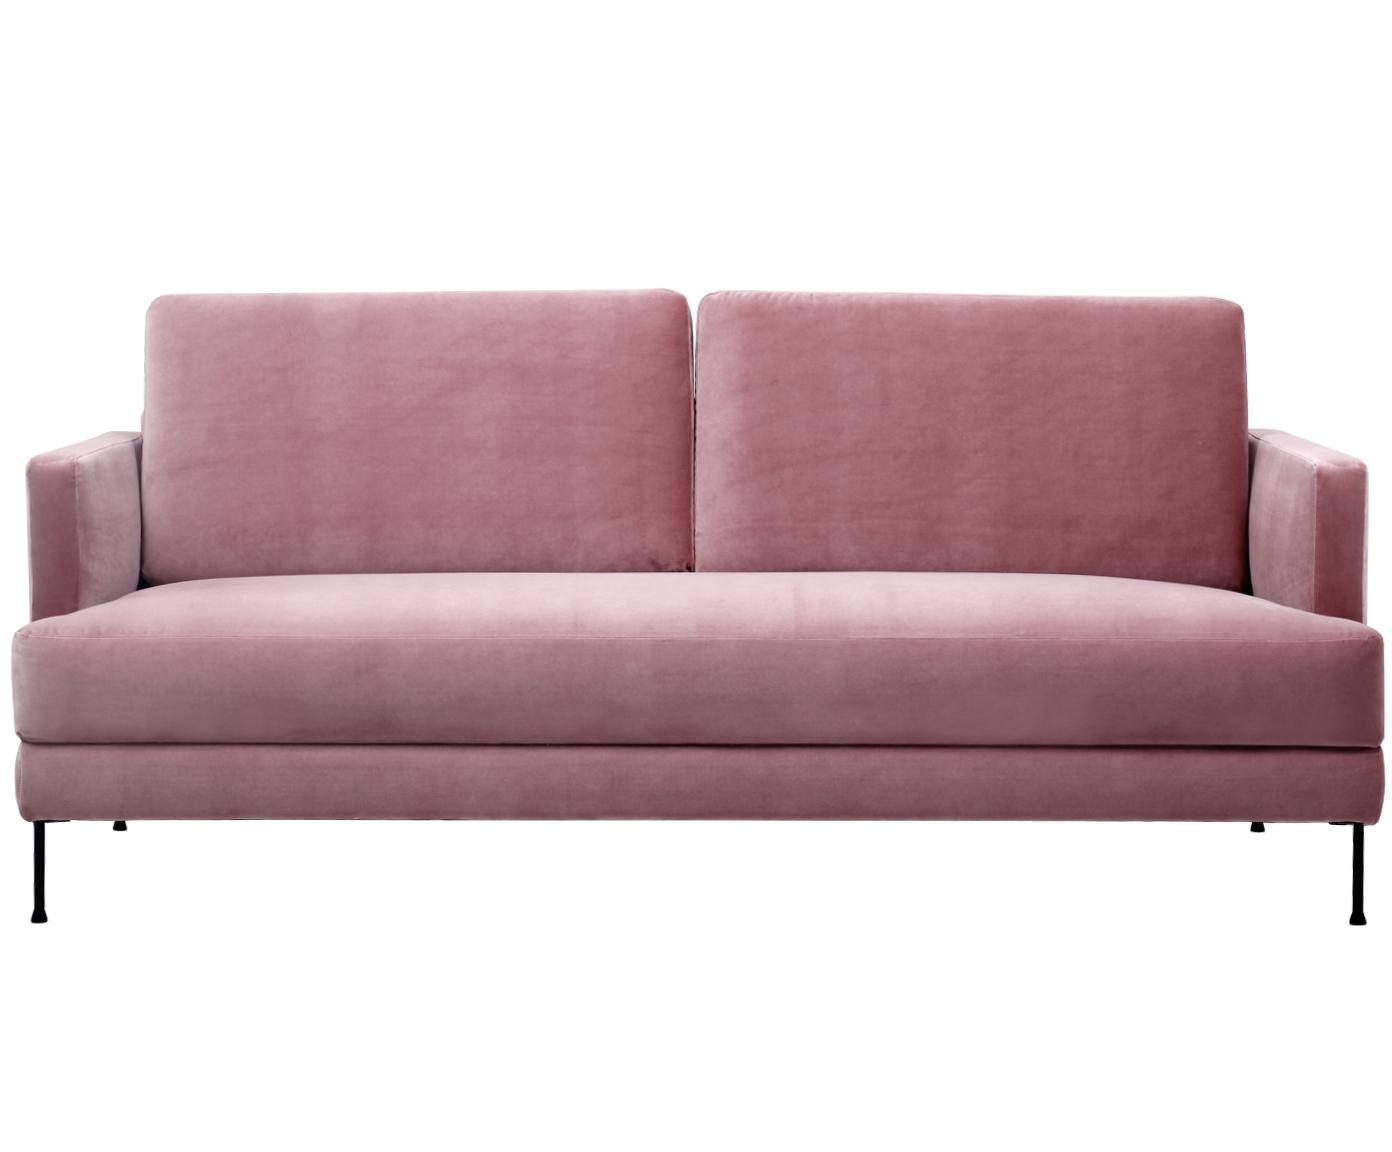 Samt-Sofa Fluente (3-Sitzer), Bezug: Samt (Hochwertiger Polyes, Gestell: Massives Kiefernholz, Füße: Metall, lackiert, Samt Rosa, B 197 x T 83 cm